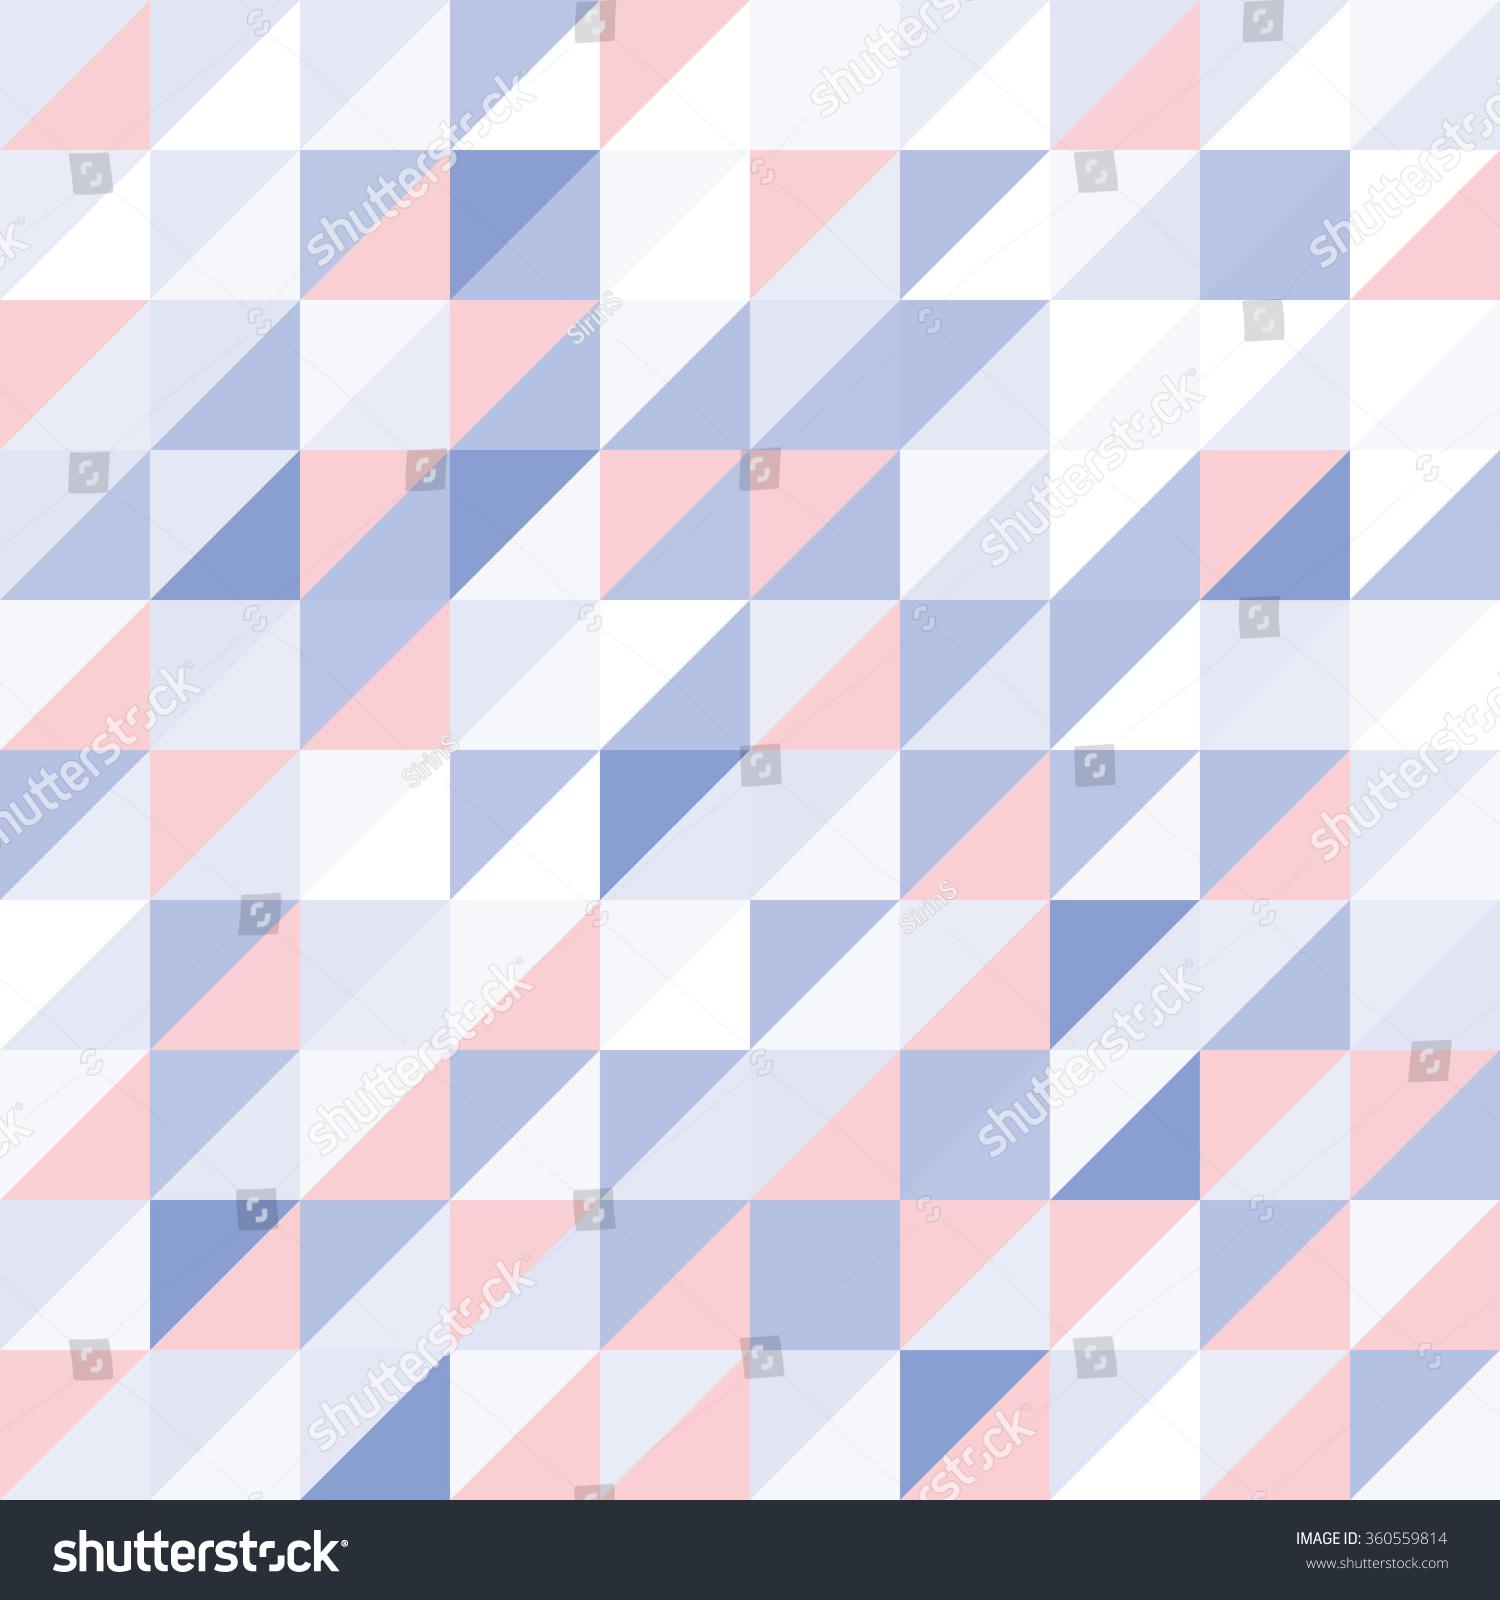 Rosequartz Serenity Tone Geometric Wallpaper Vector Stock Vector